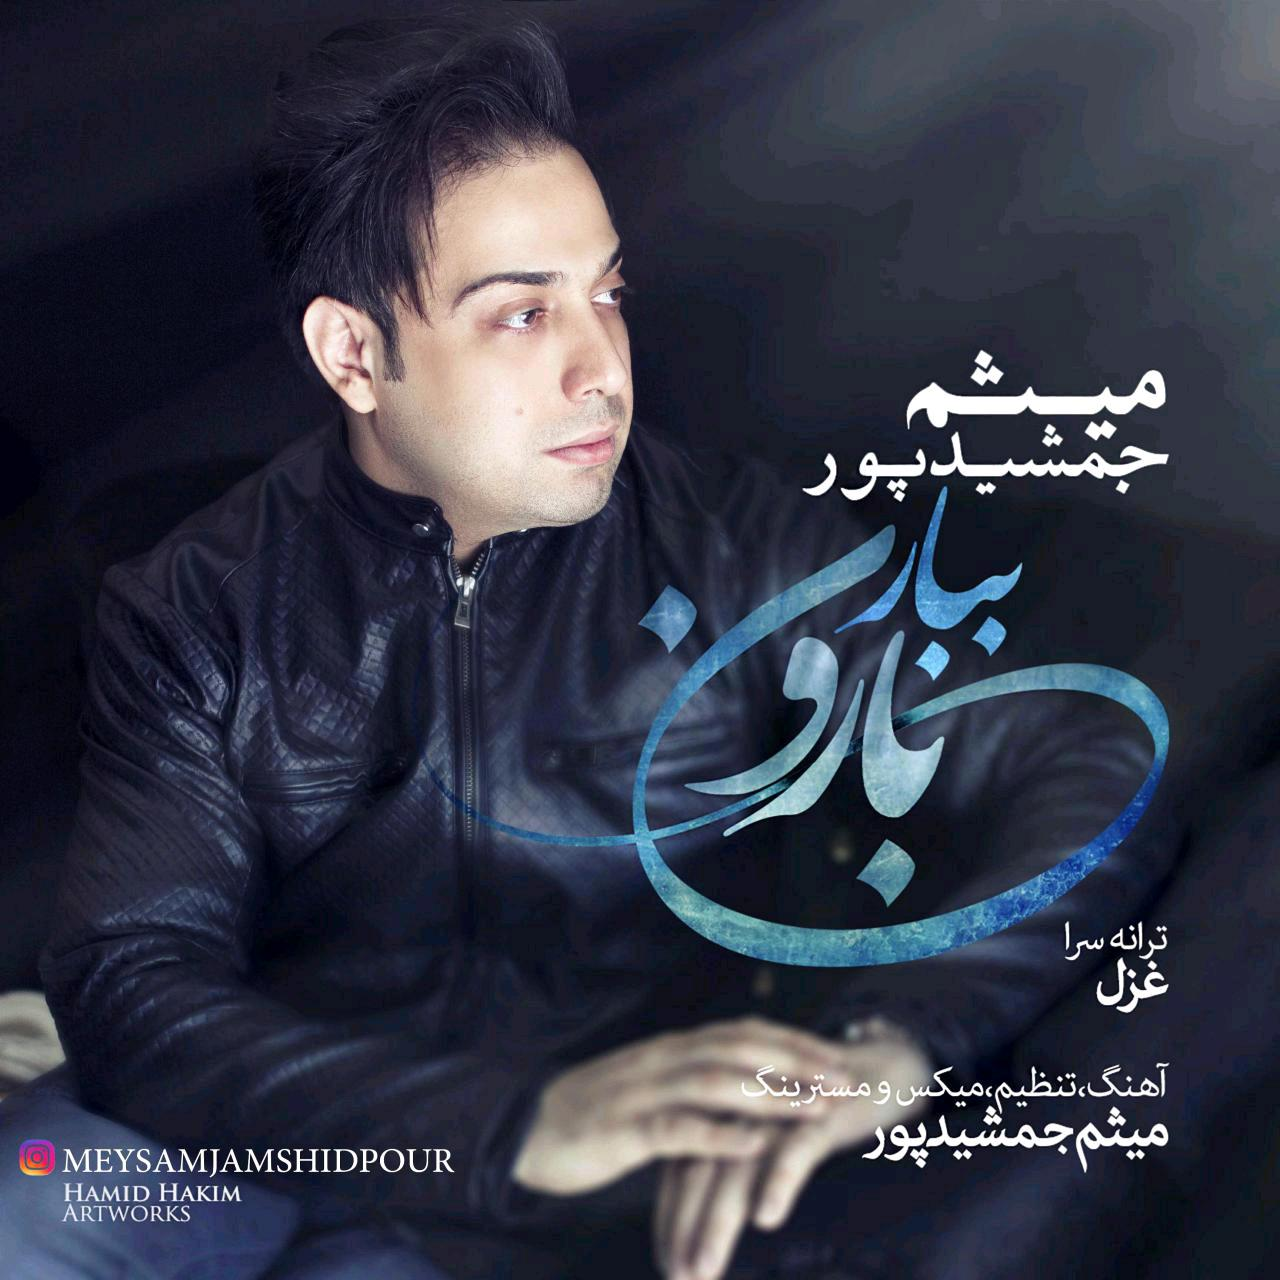 Meysam Jamshidpour – Bebar Baroon